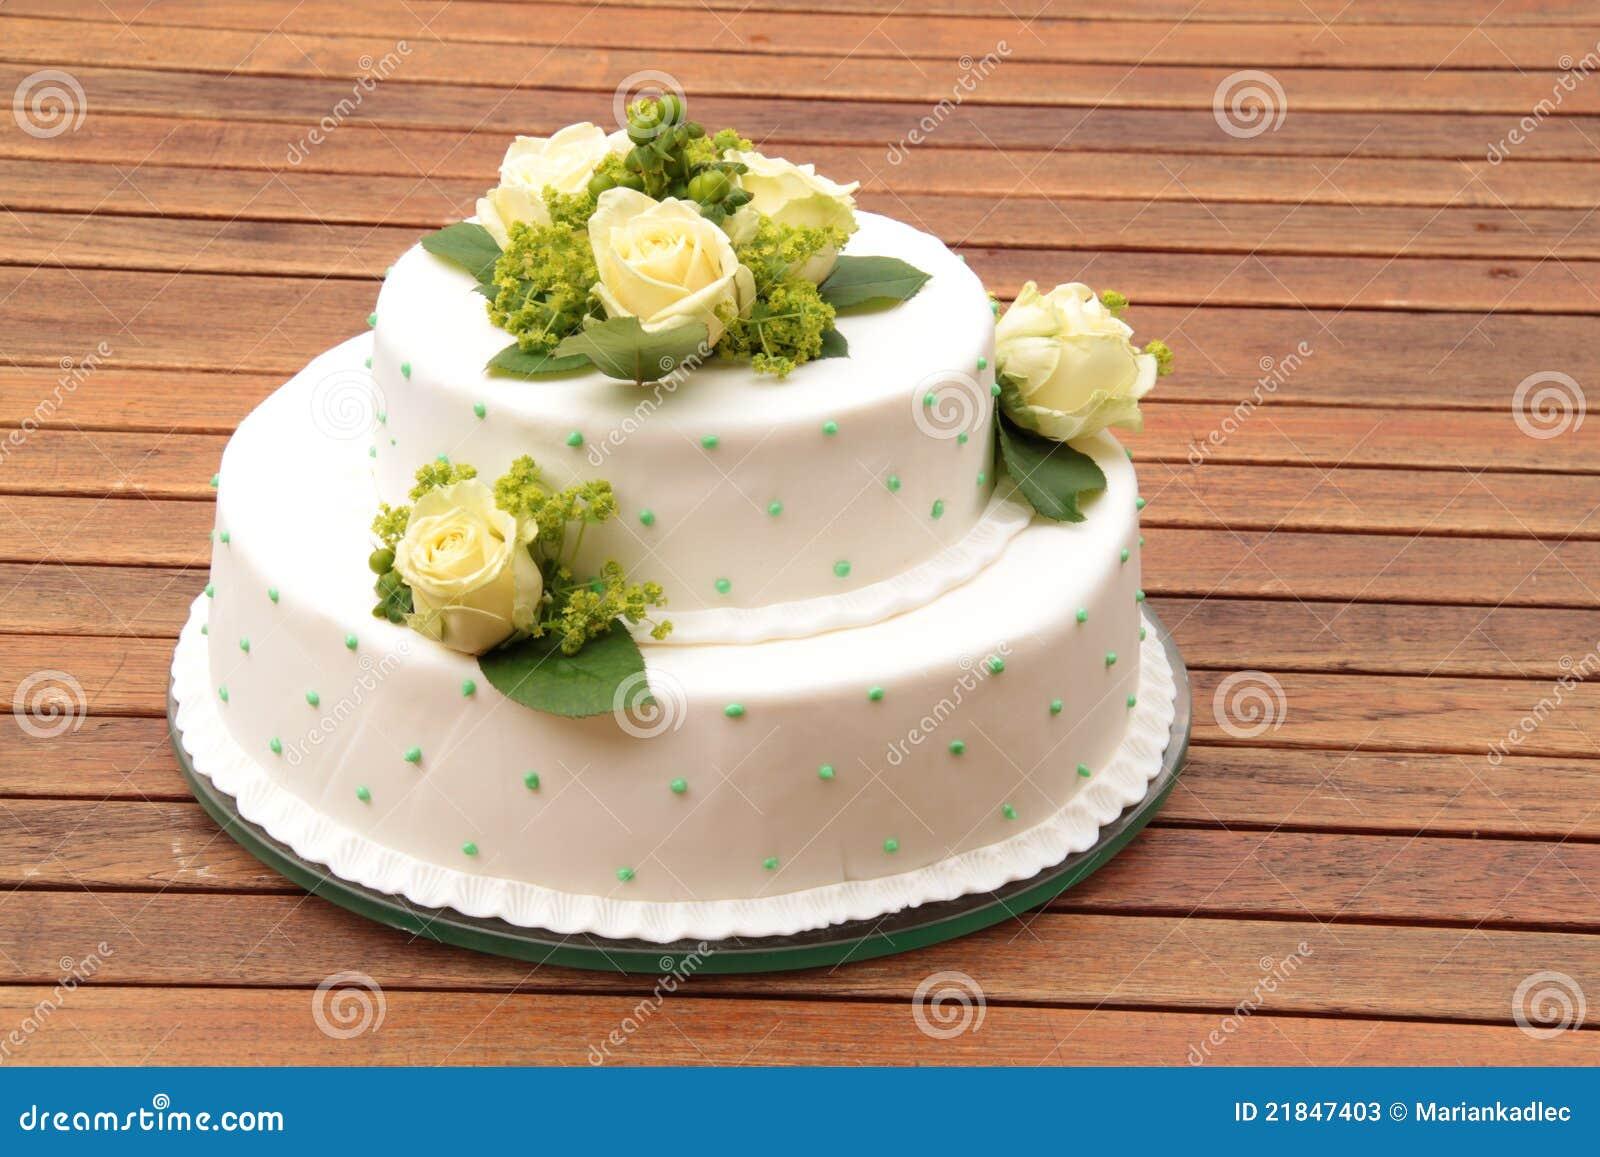 Marzipan A Fruit Wedding Cake